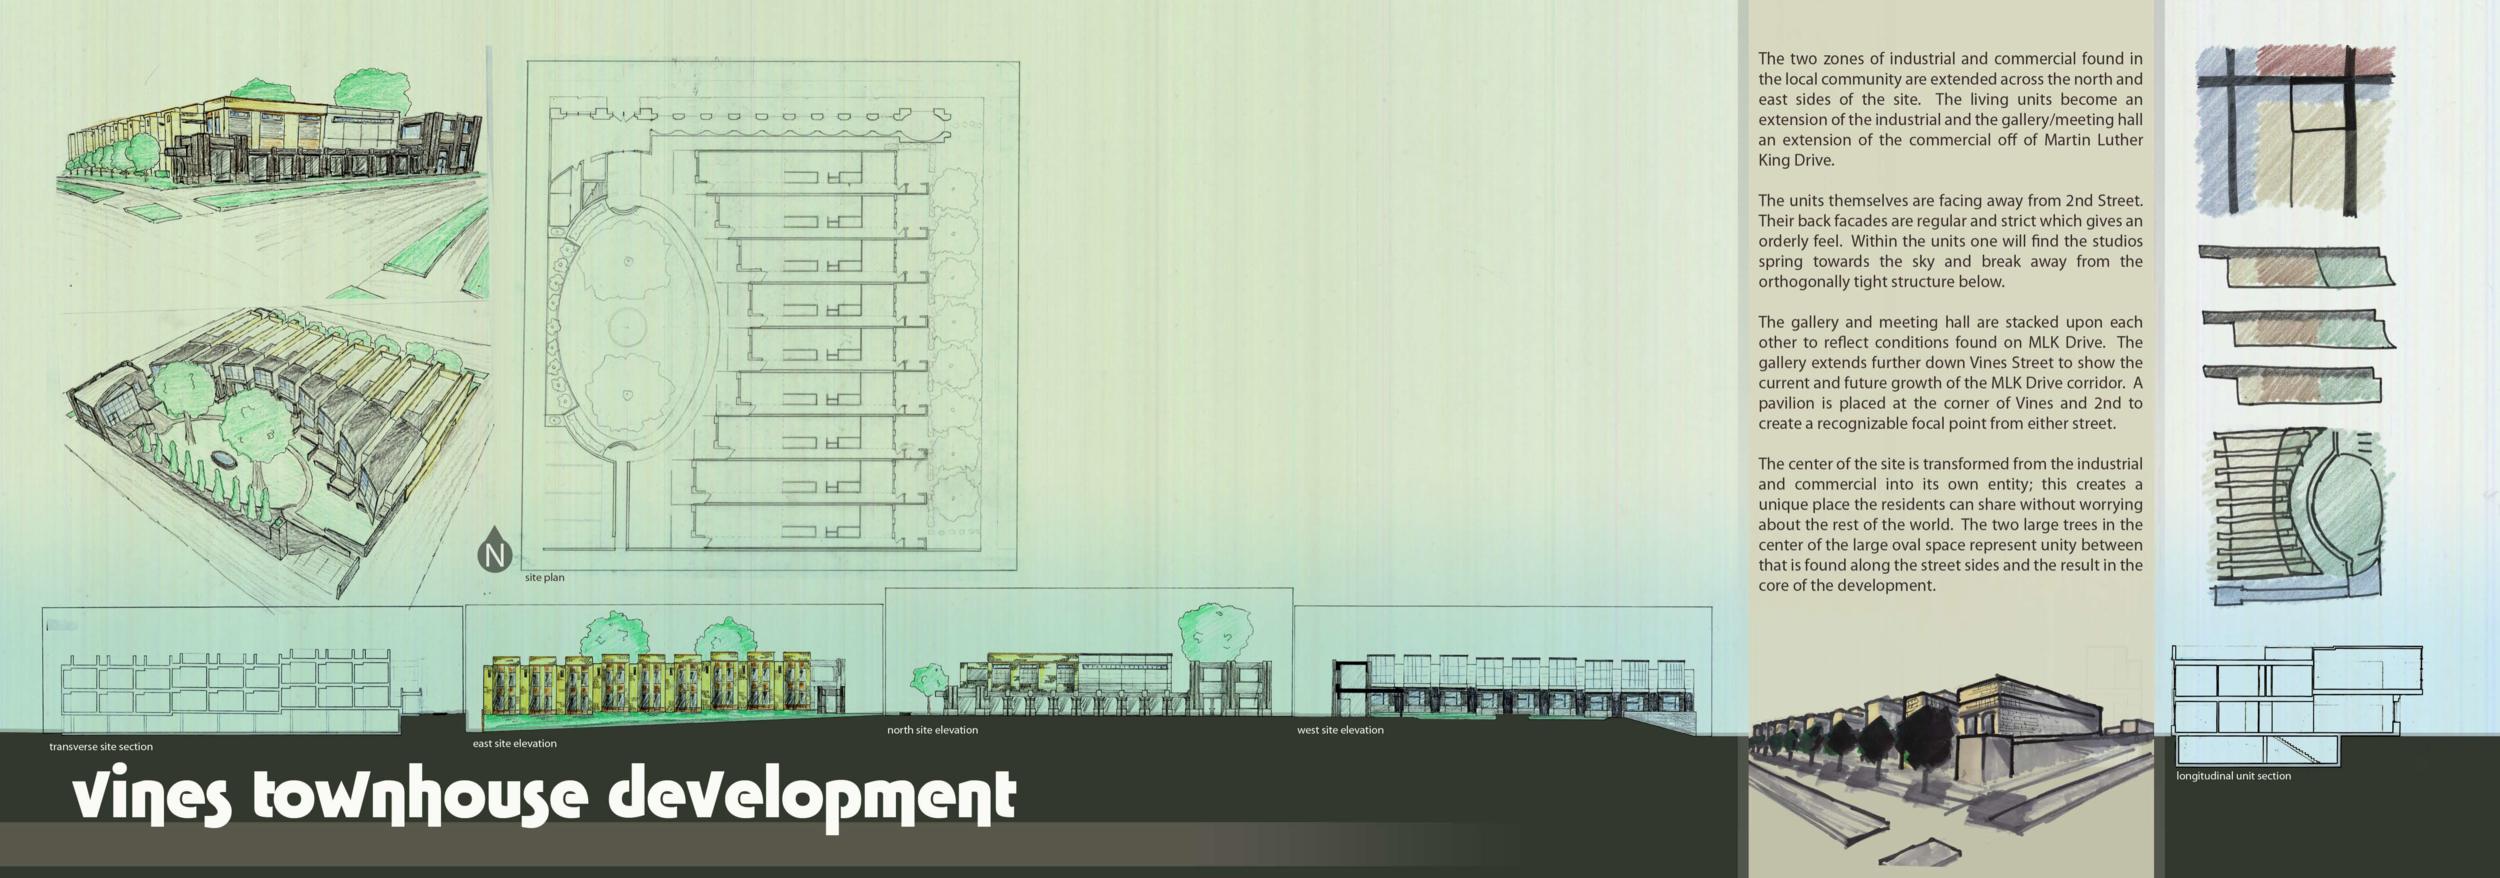 Vines Townhouse Development